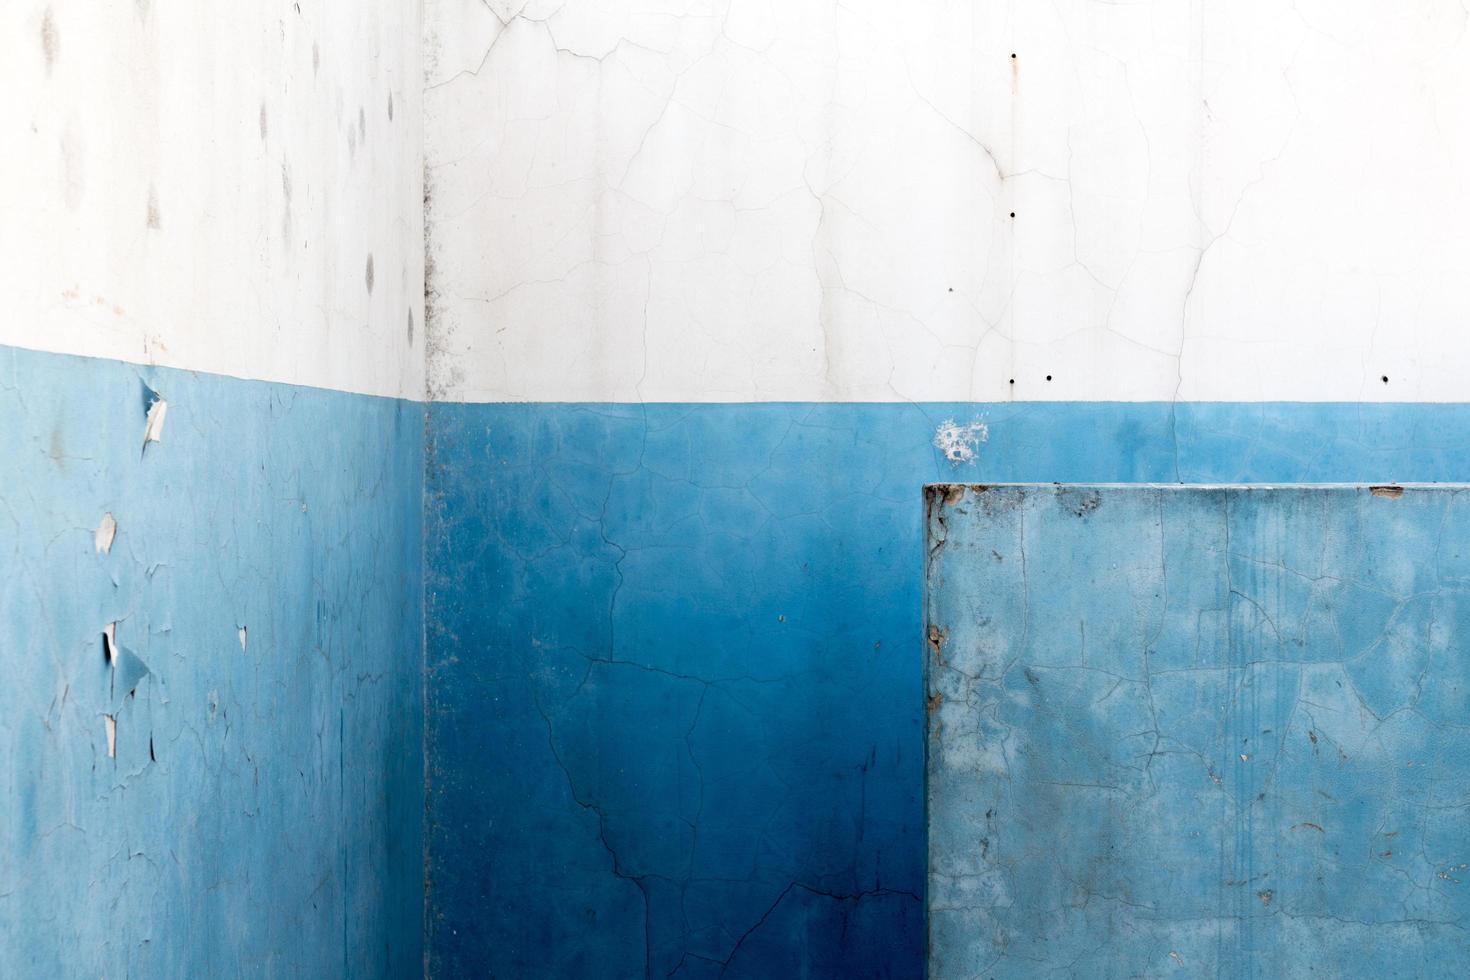 muro de concreto azul foto